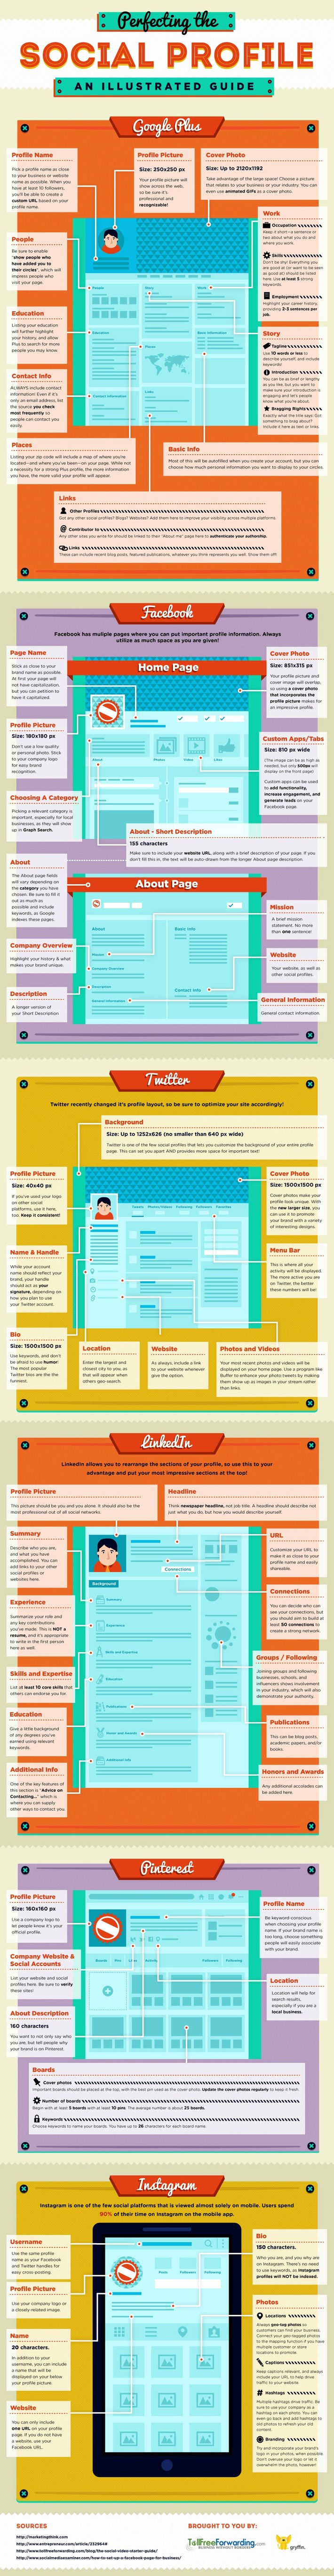 Perfecting Your Social Media Profiles | Machinimania | Scoop.it